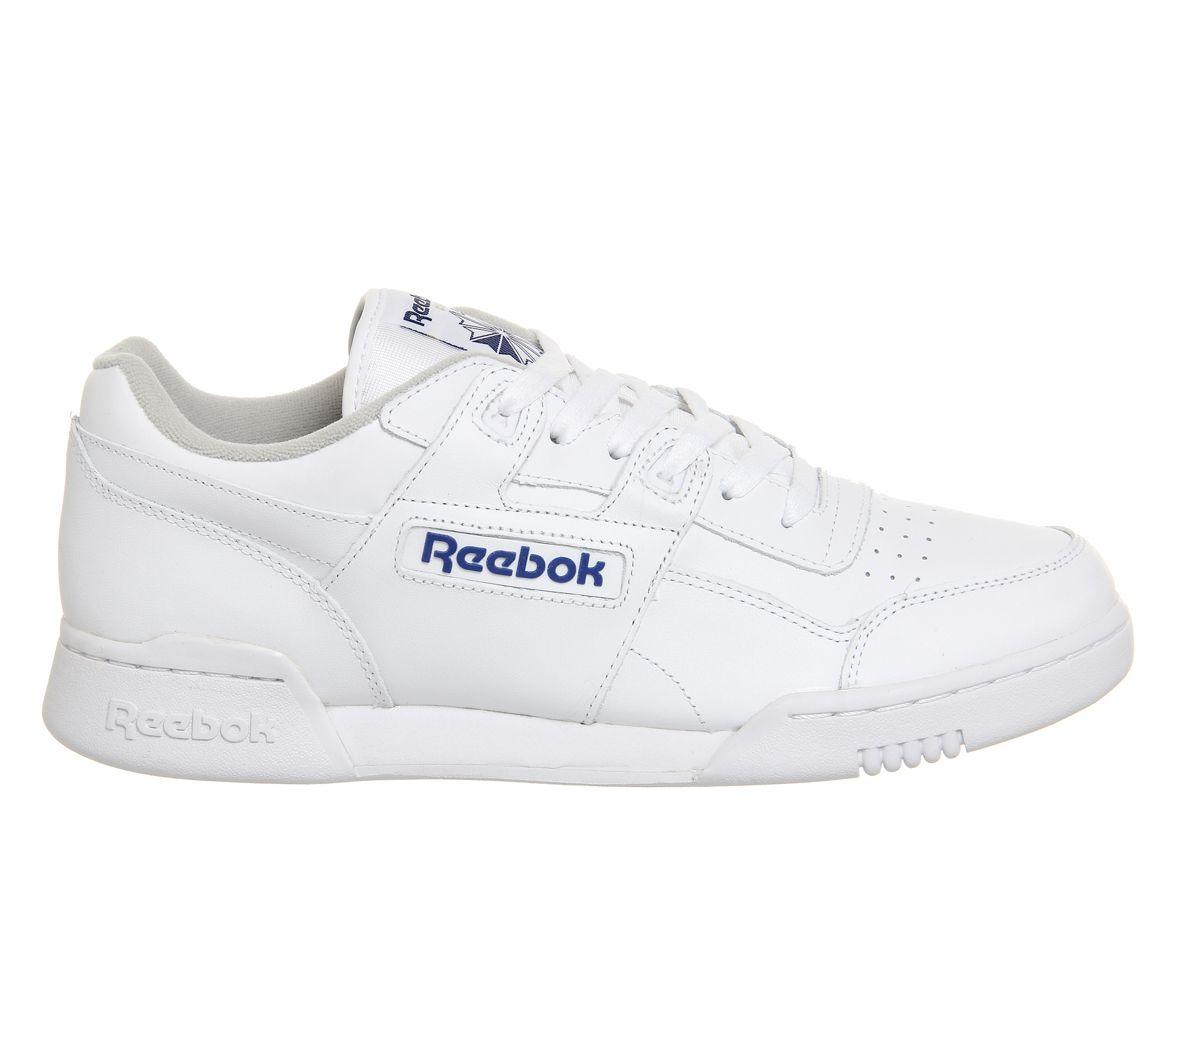 Reebok-Workout-Plus-Blanc-Royal-Baskets-Chaussures miniature 4